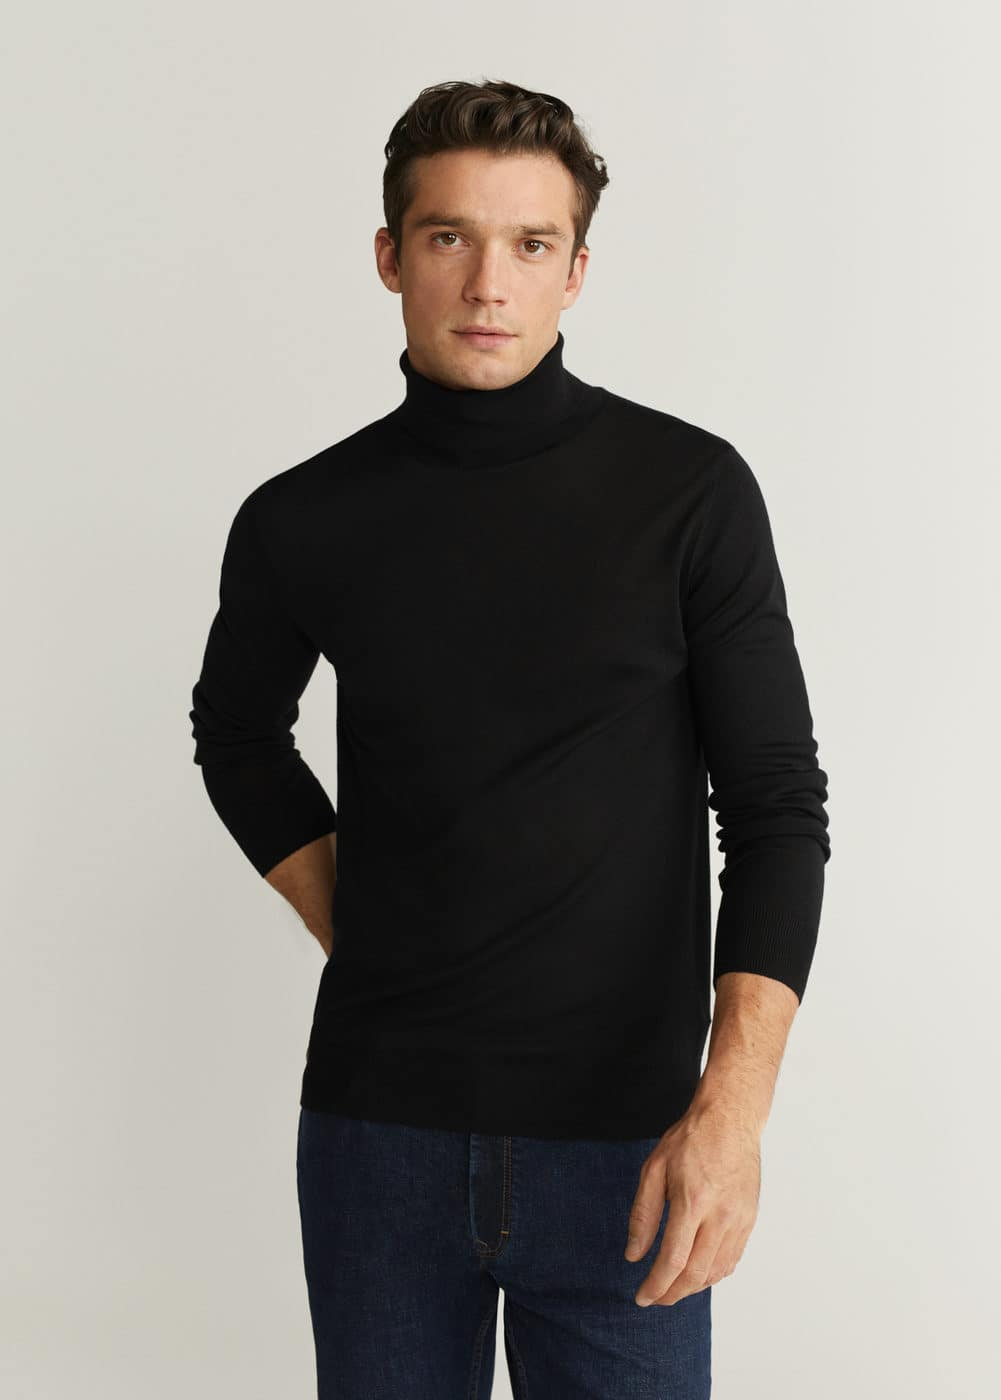 h-willyt:jersey 100% lana merino lavable